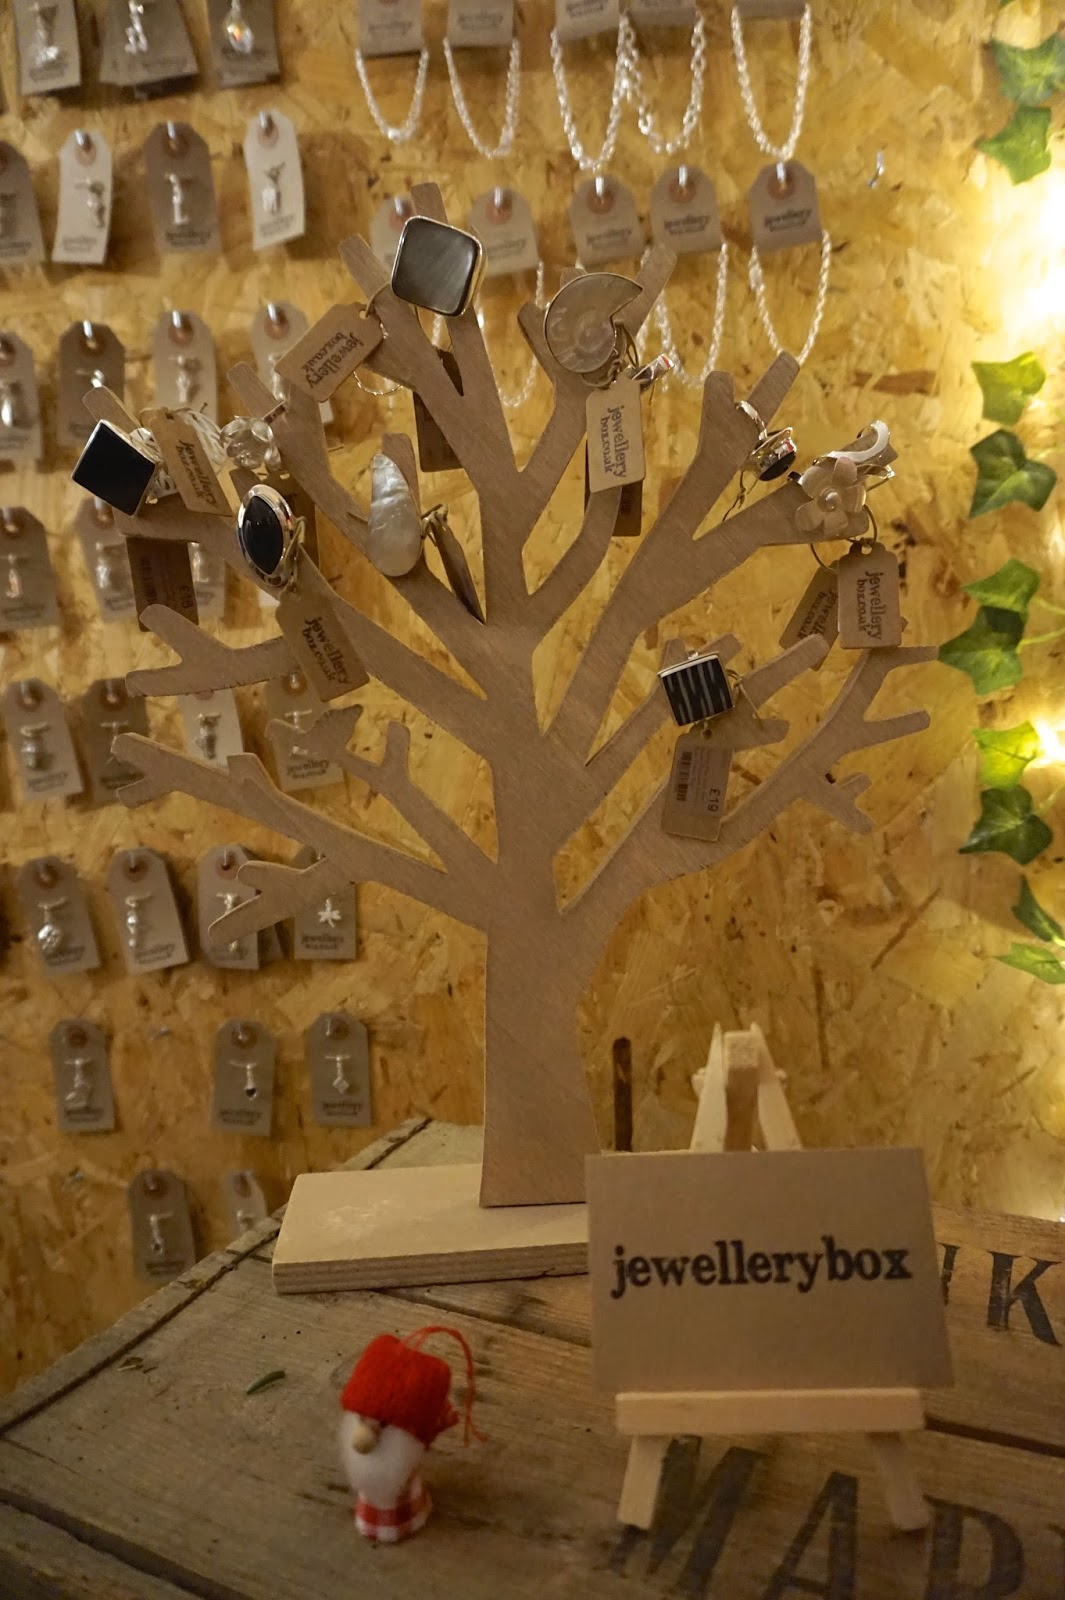 jewellery box winter bloggers event london